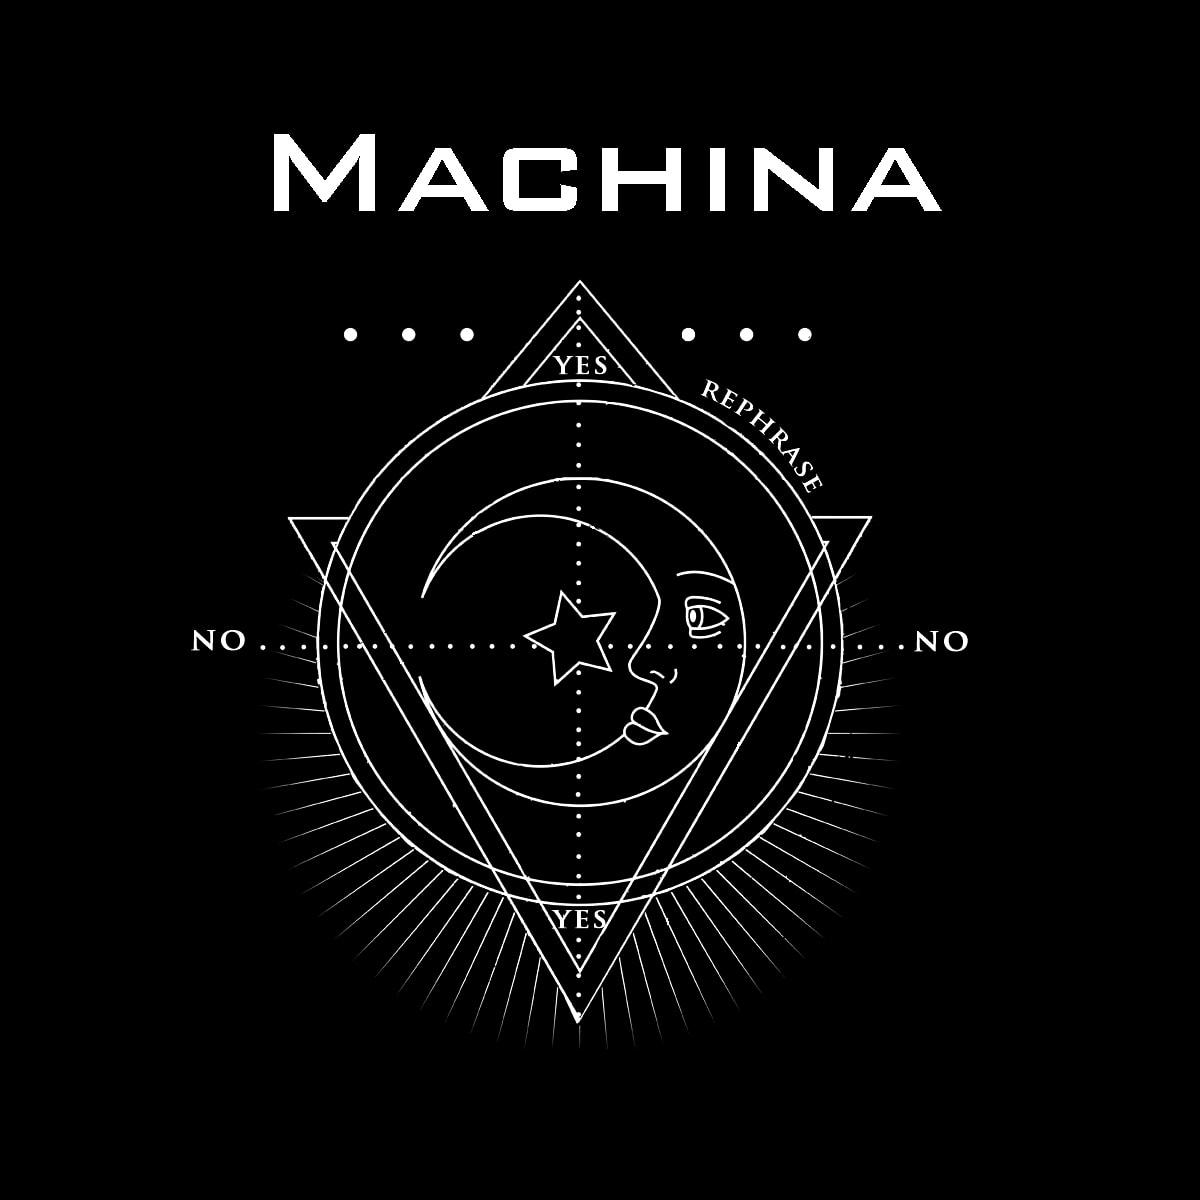 New Machina-min